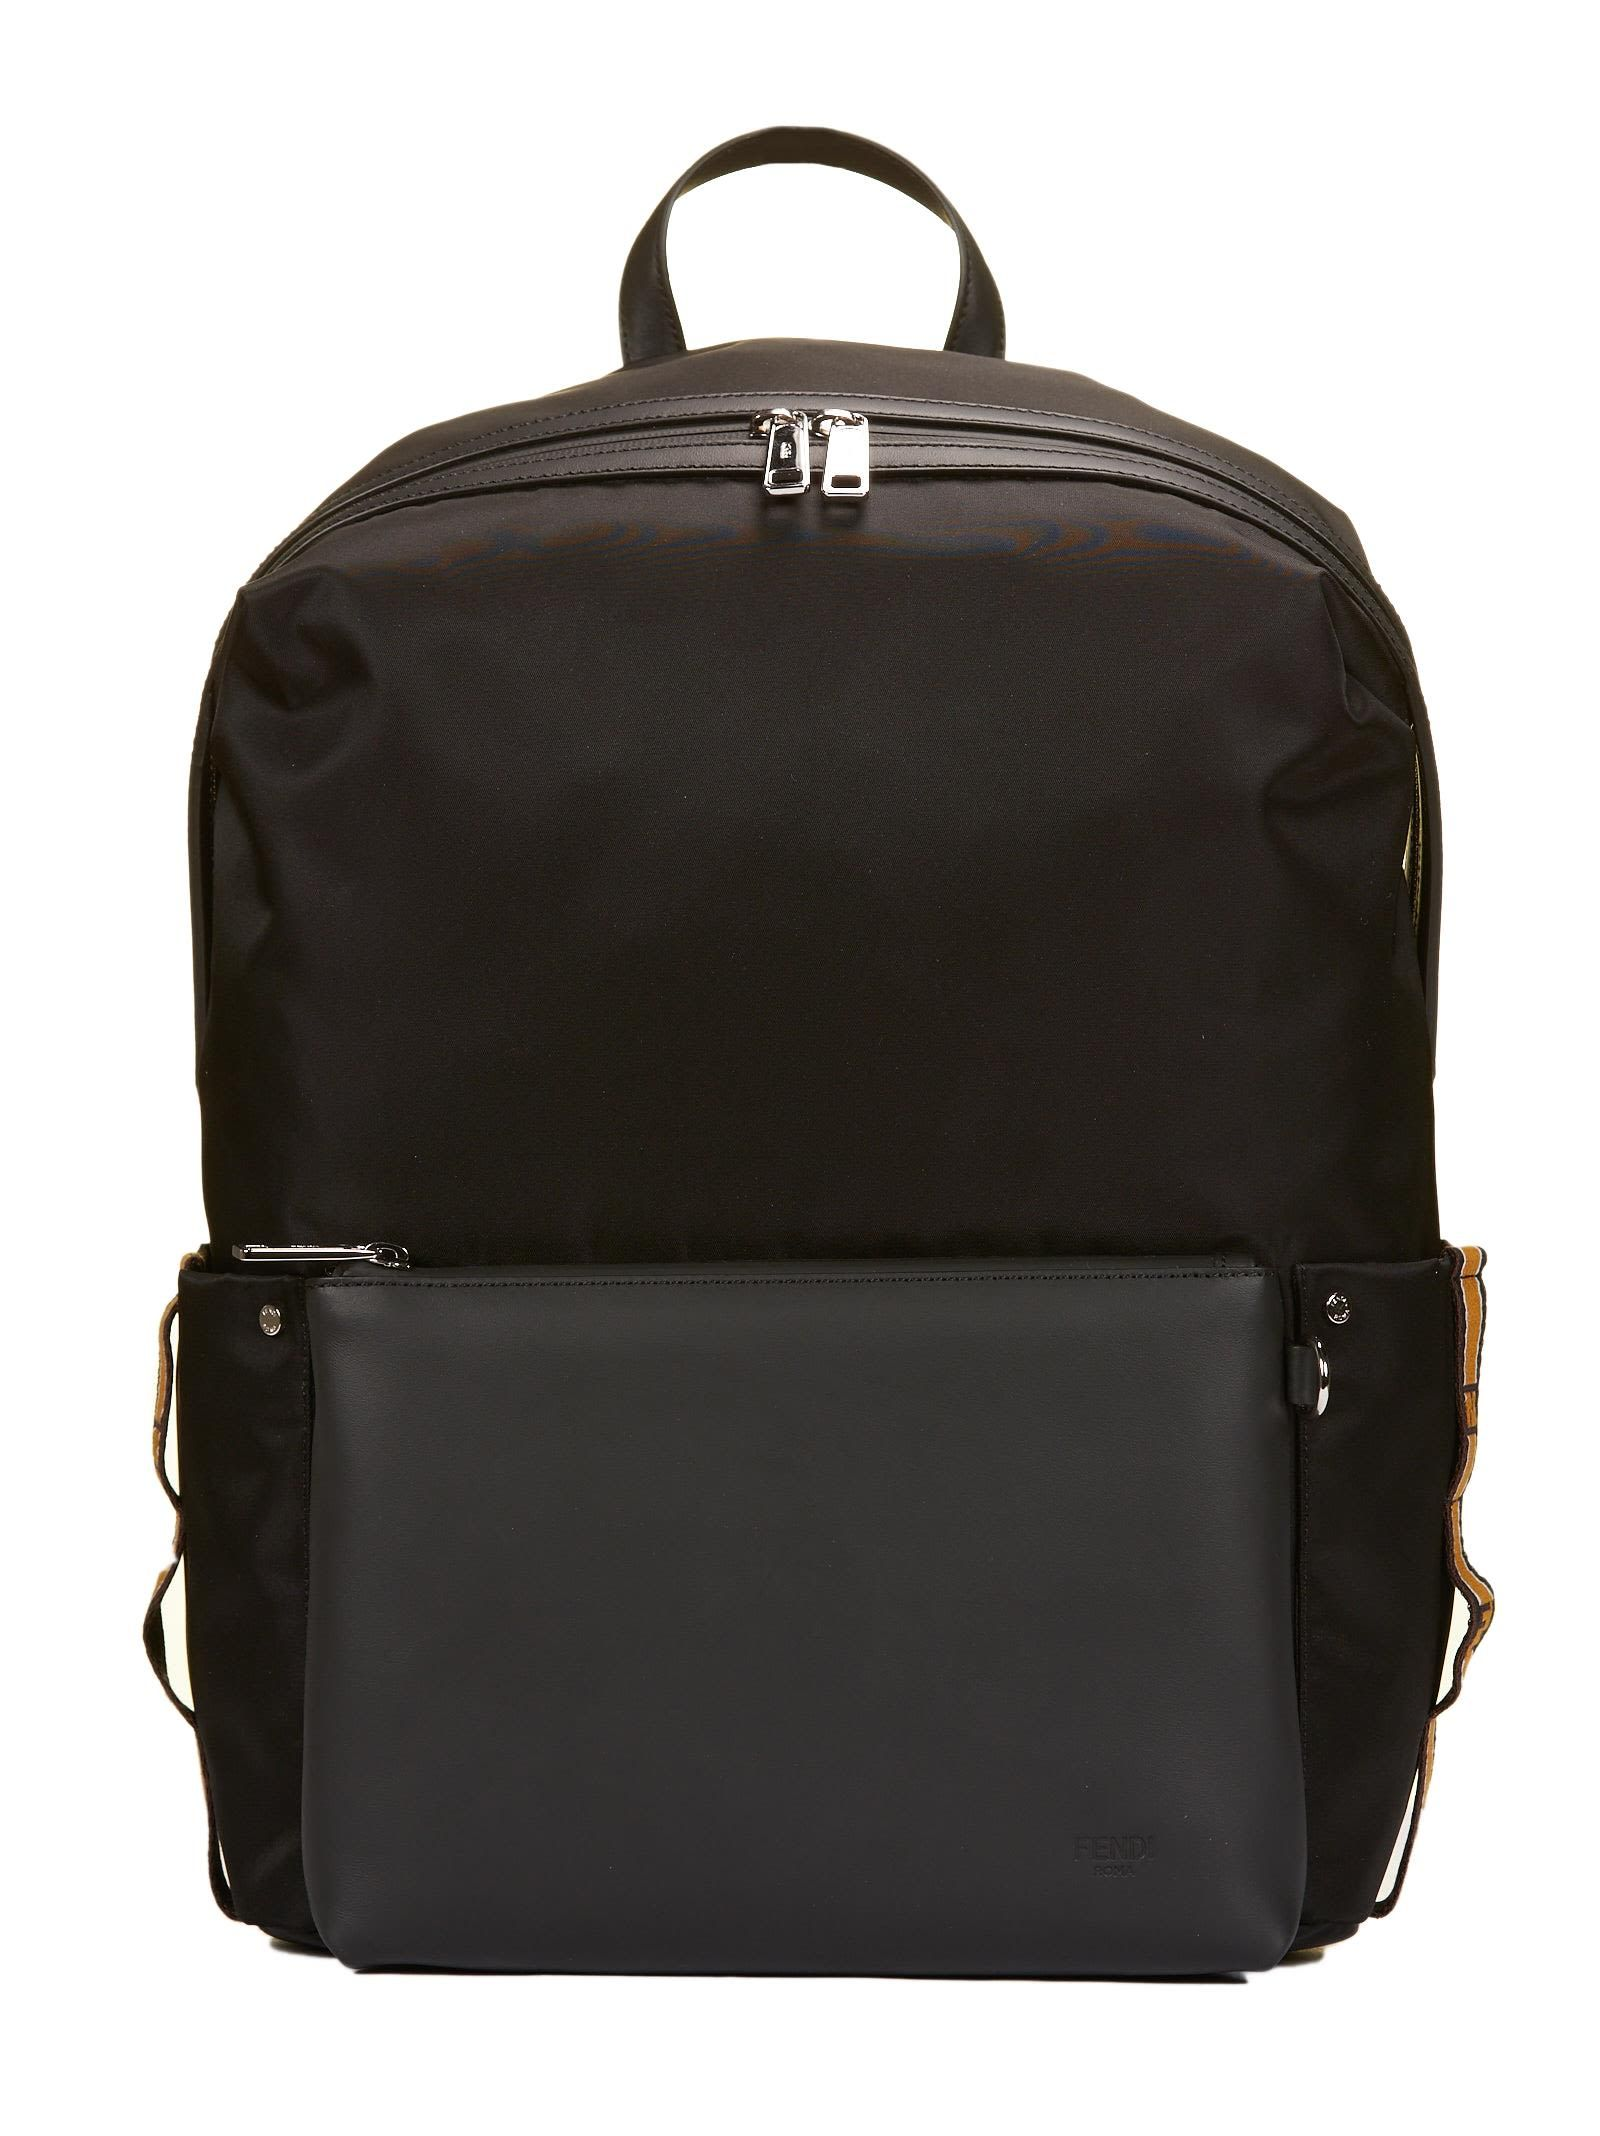 0cea32969c48 FENDI LOGO PRINTED BAG BUGS BACKPACK.  fendi  bags